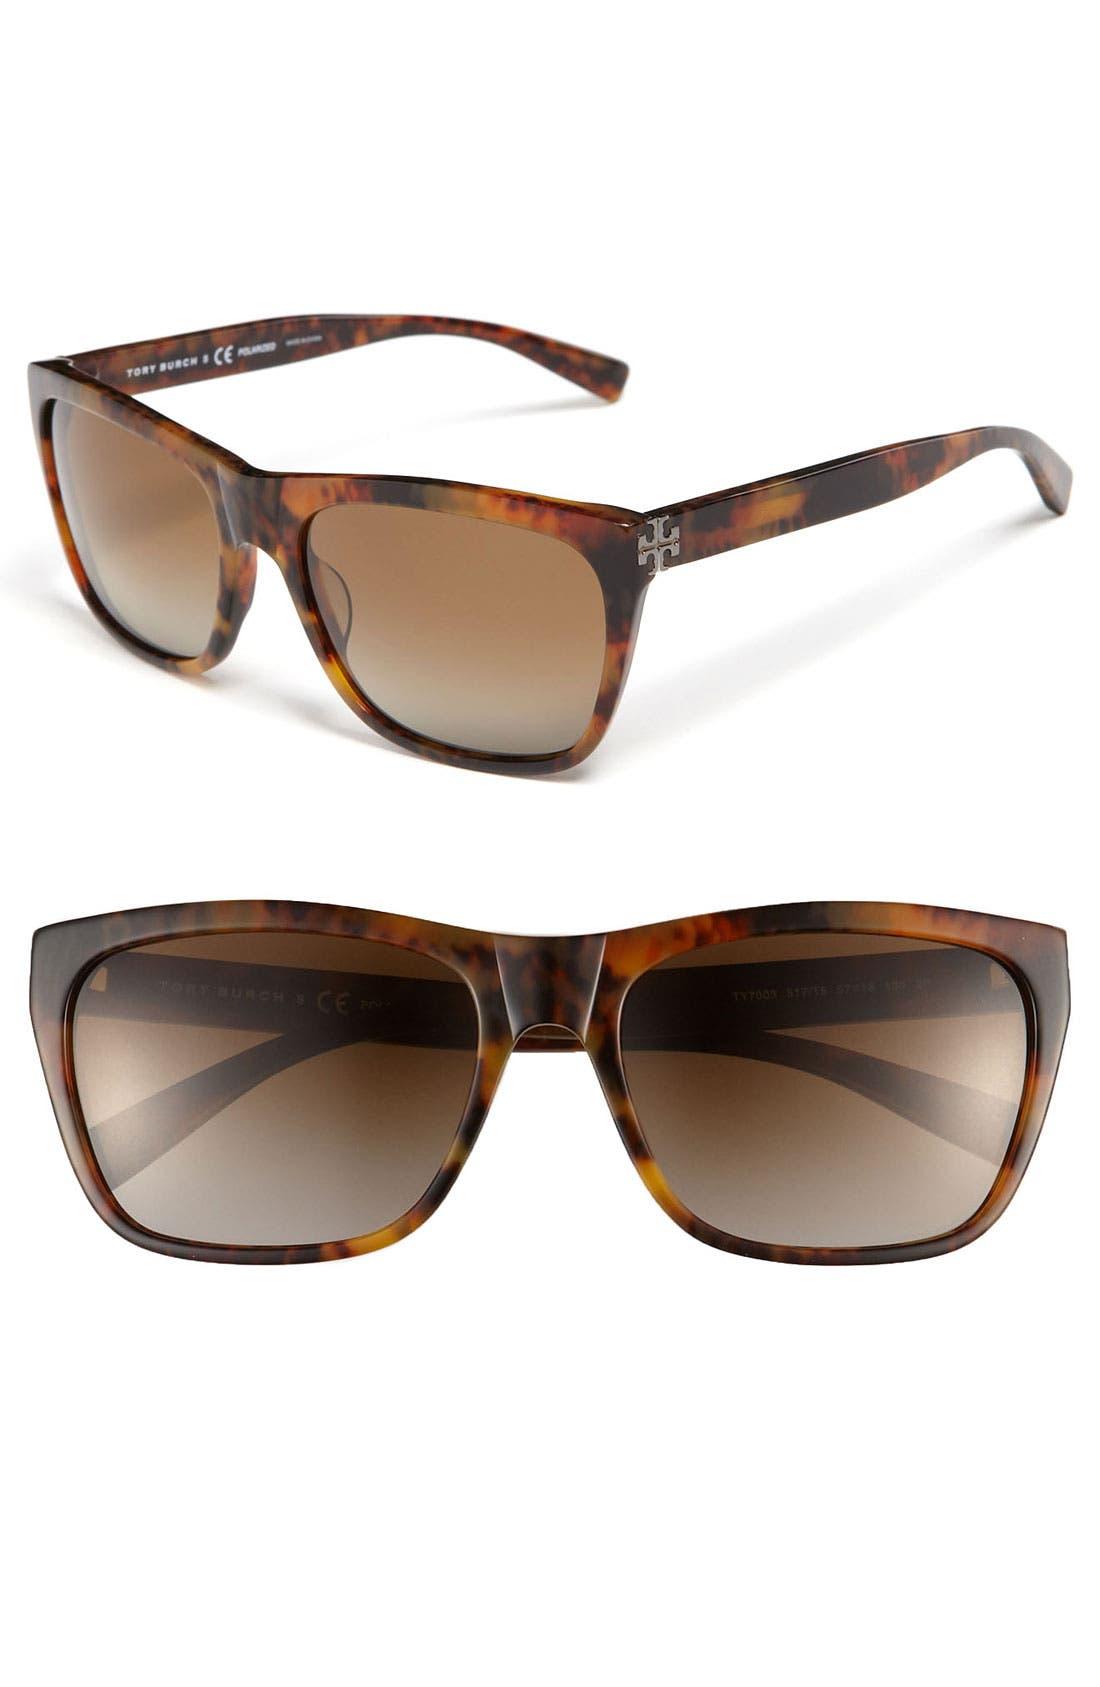 Main Image - Tory Burch 57mm Polarized Sunglasses